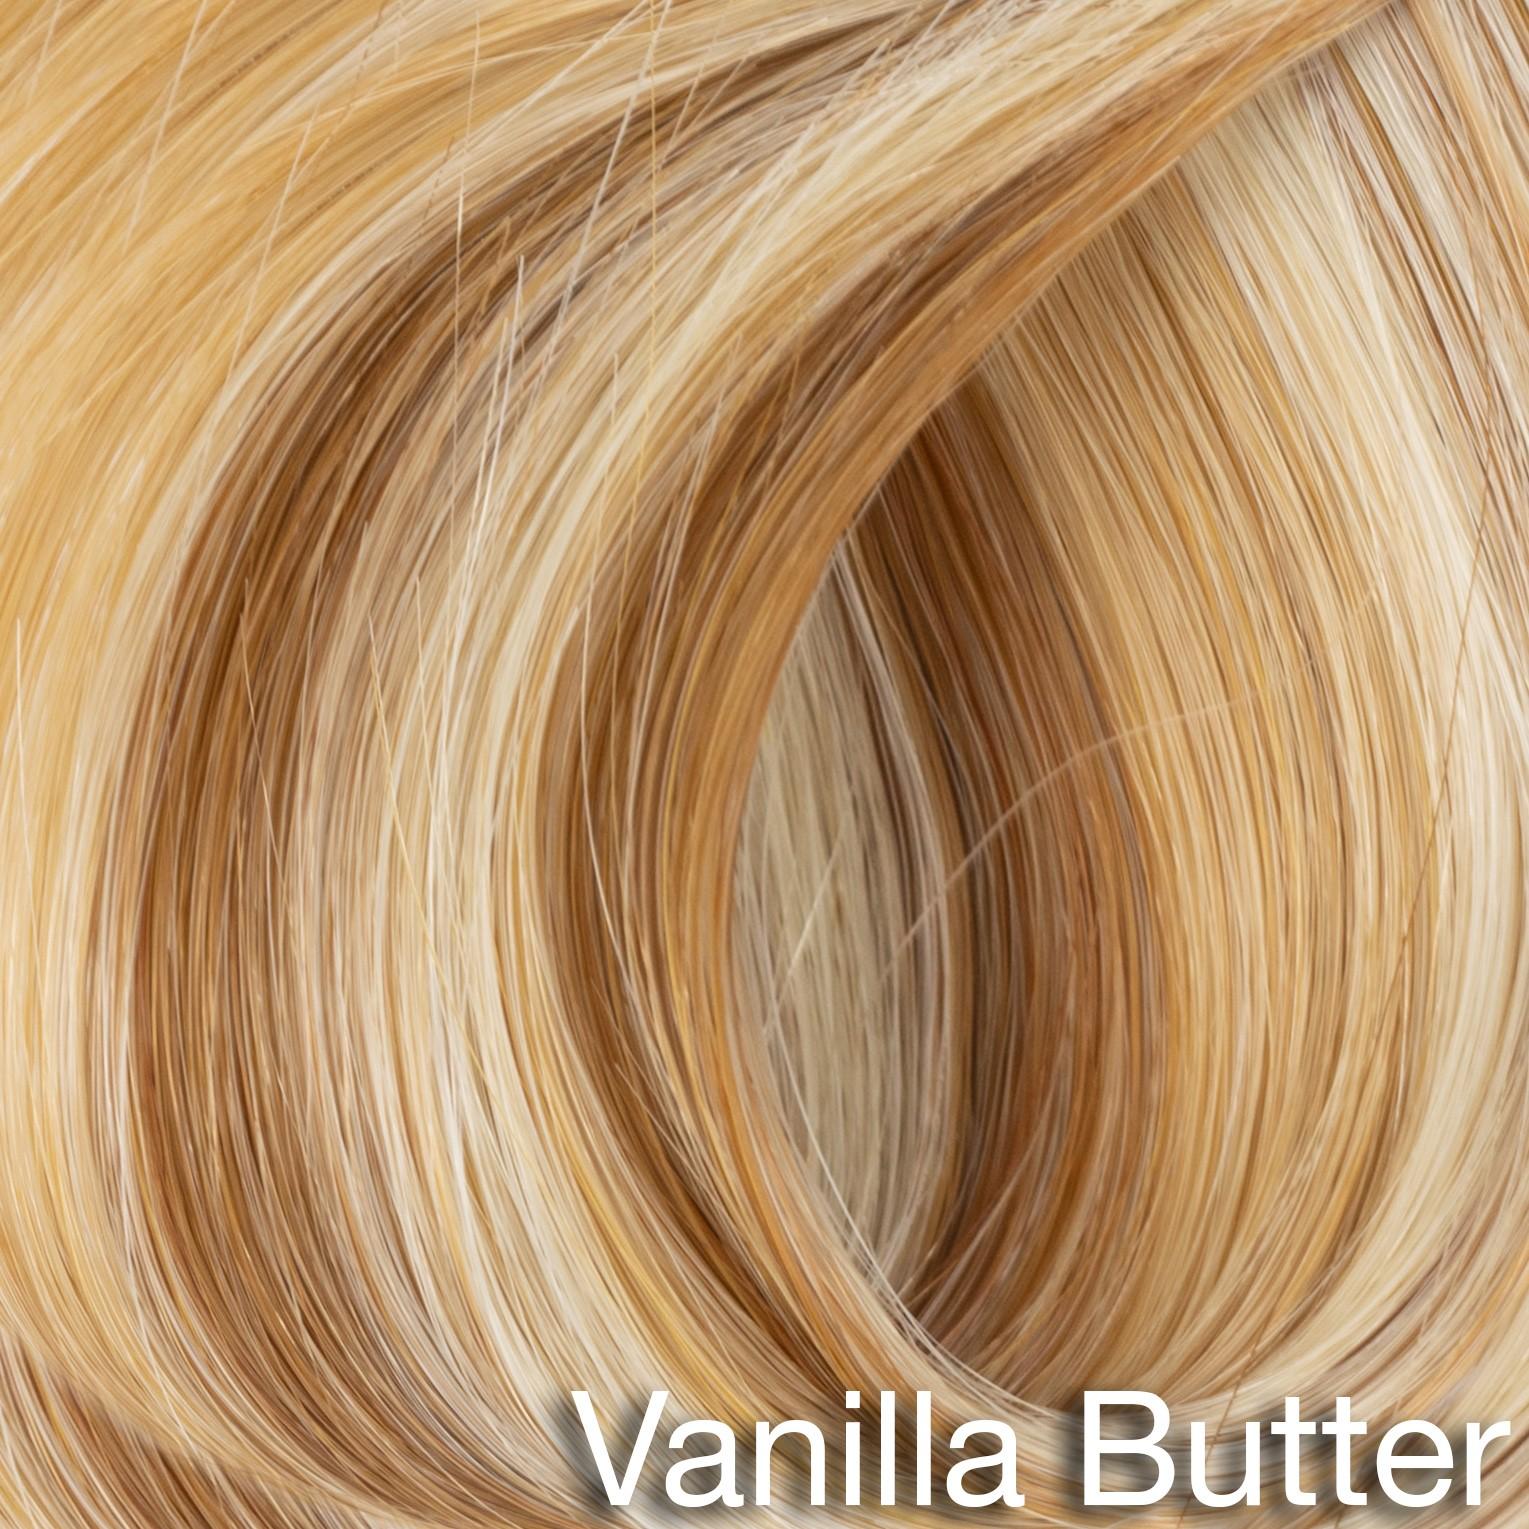 Vanilla Butter